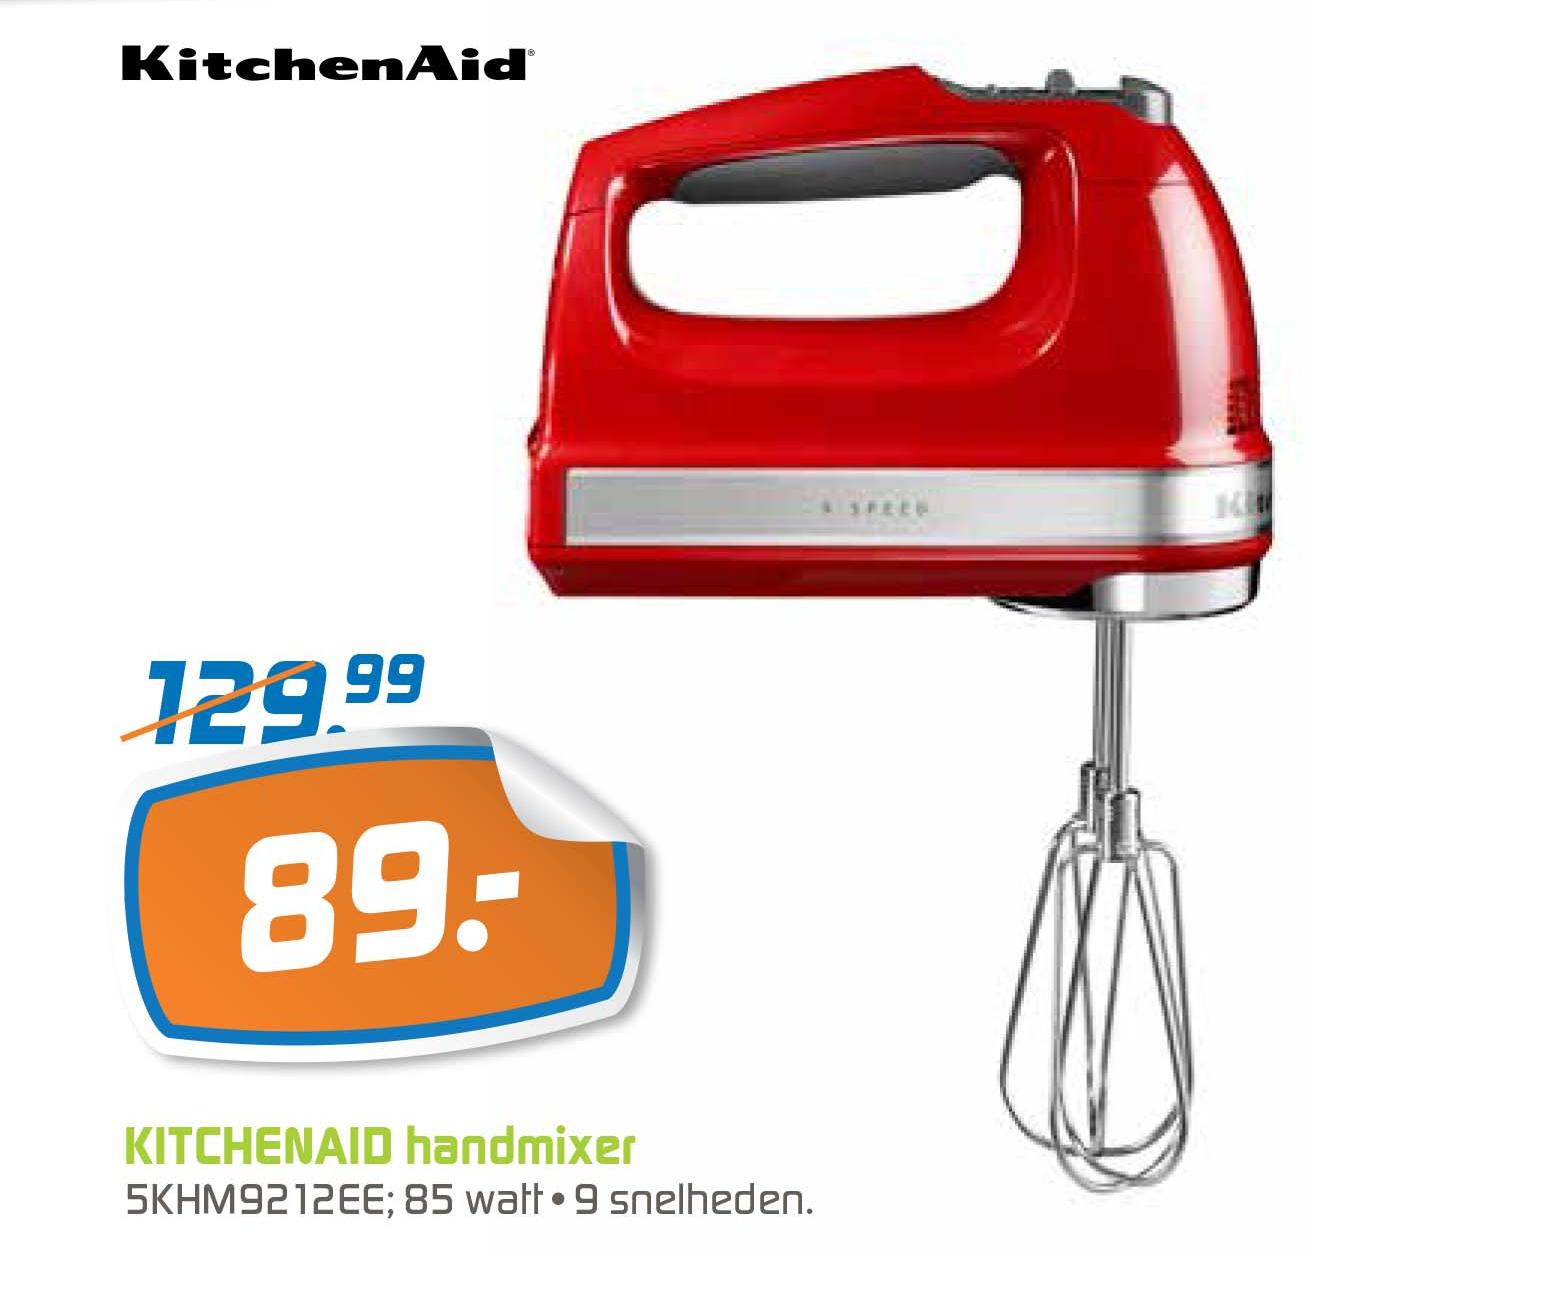 BCC Kitchenaid 5KHM9212EE Handmixer